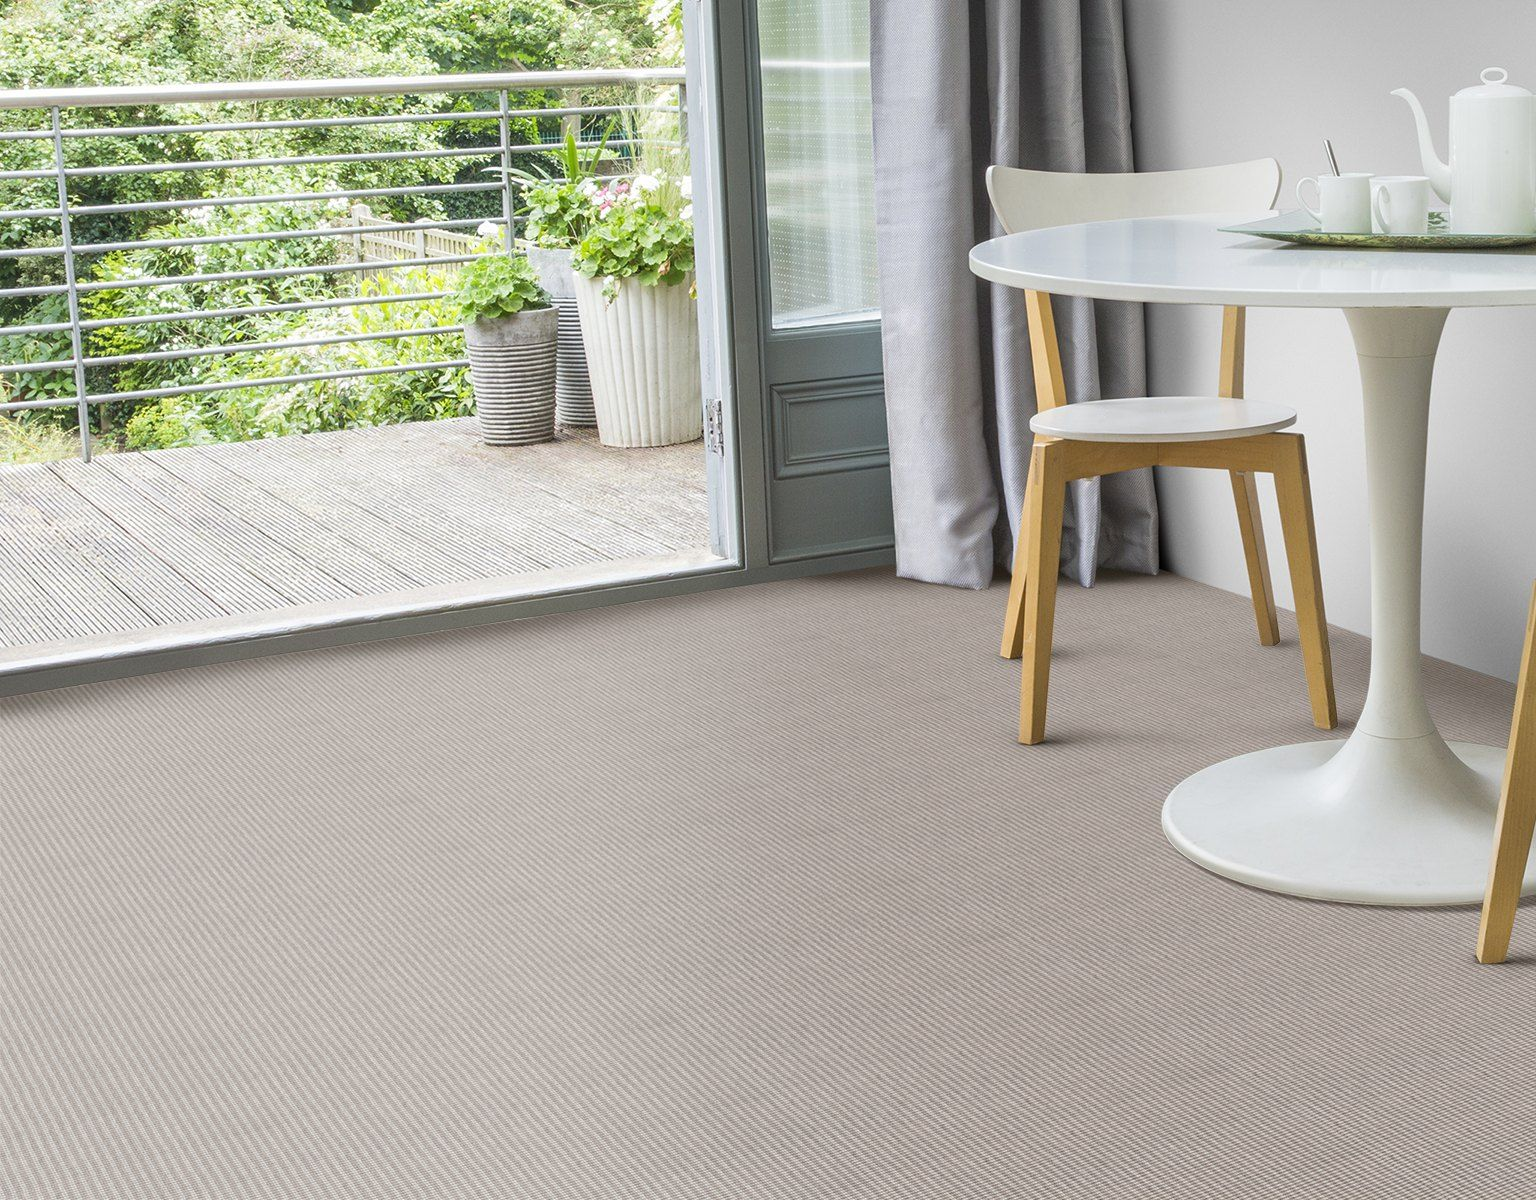 Wool Crafty Hound Harrier Carpet Carpet, Wool carpet